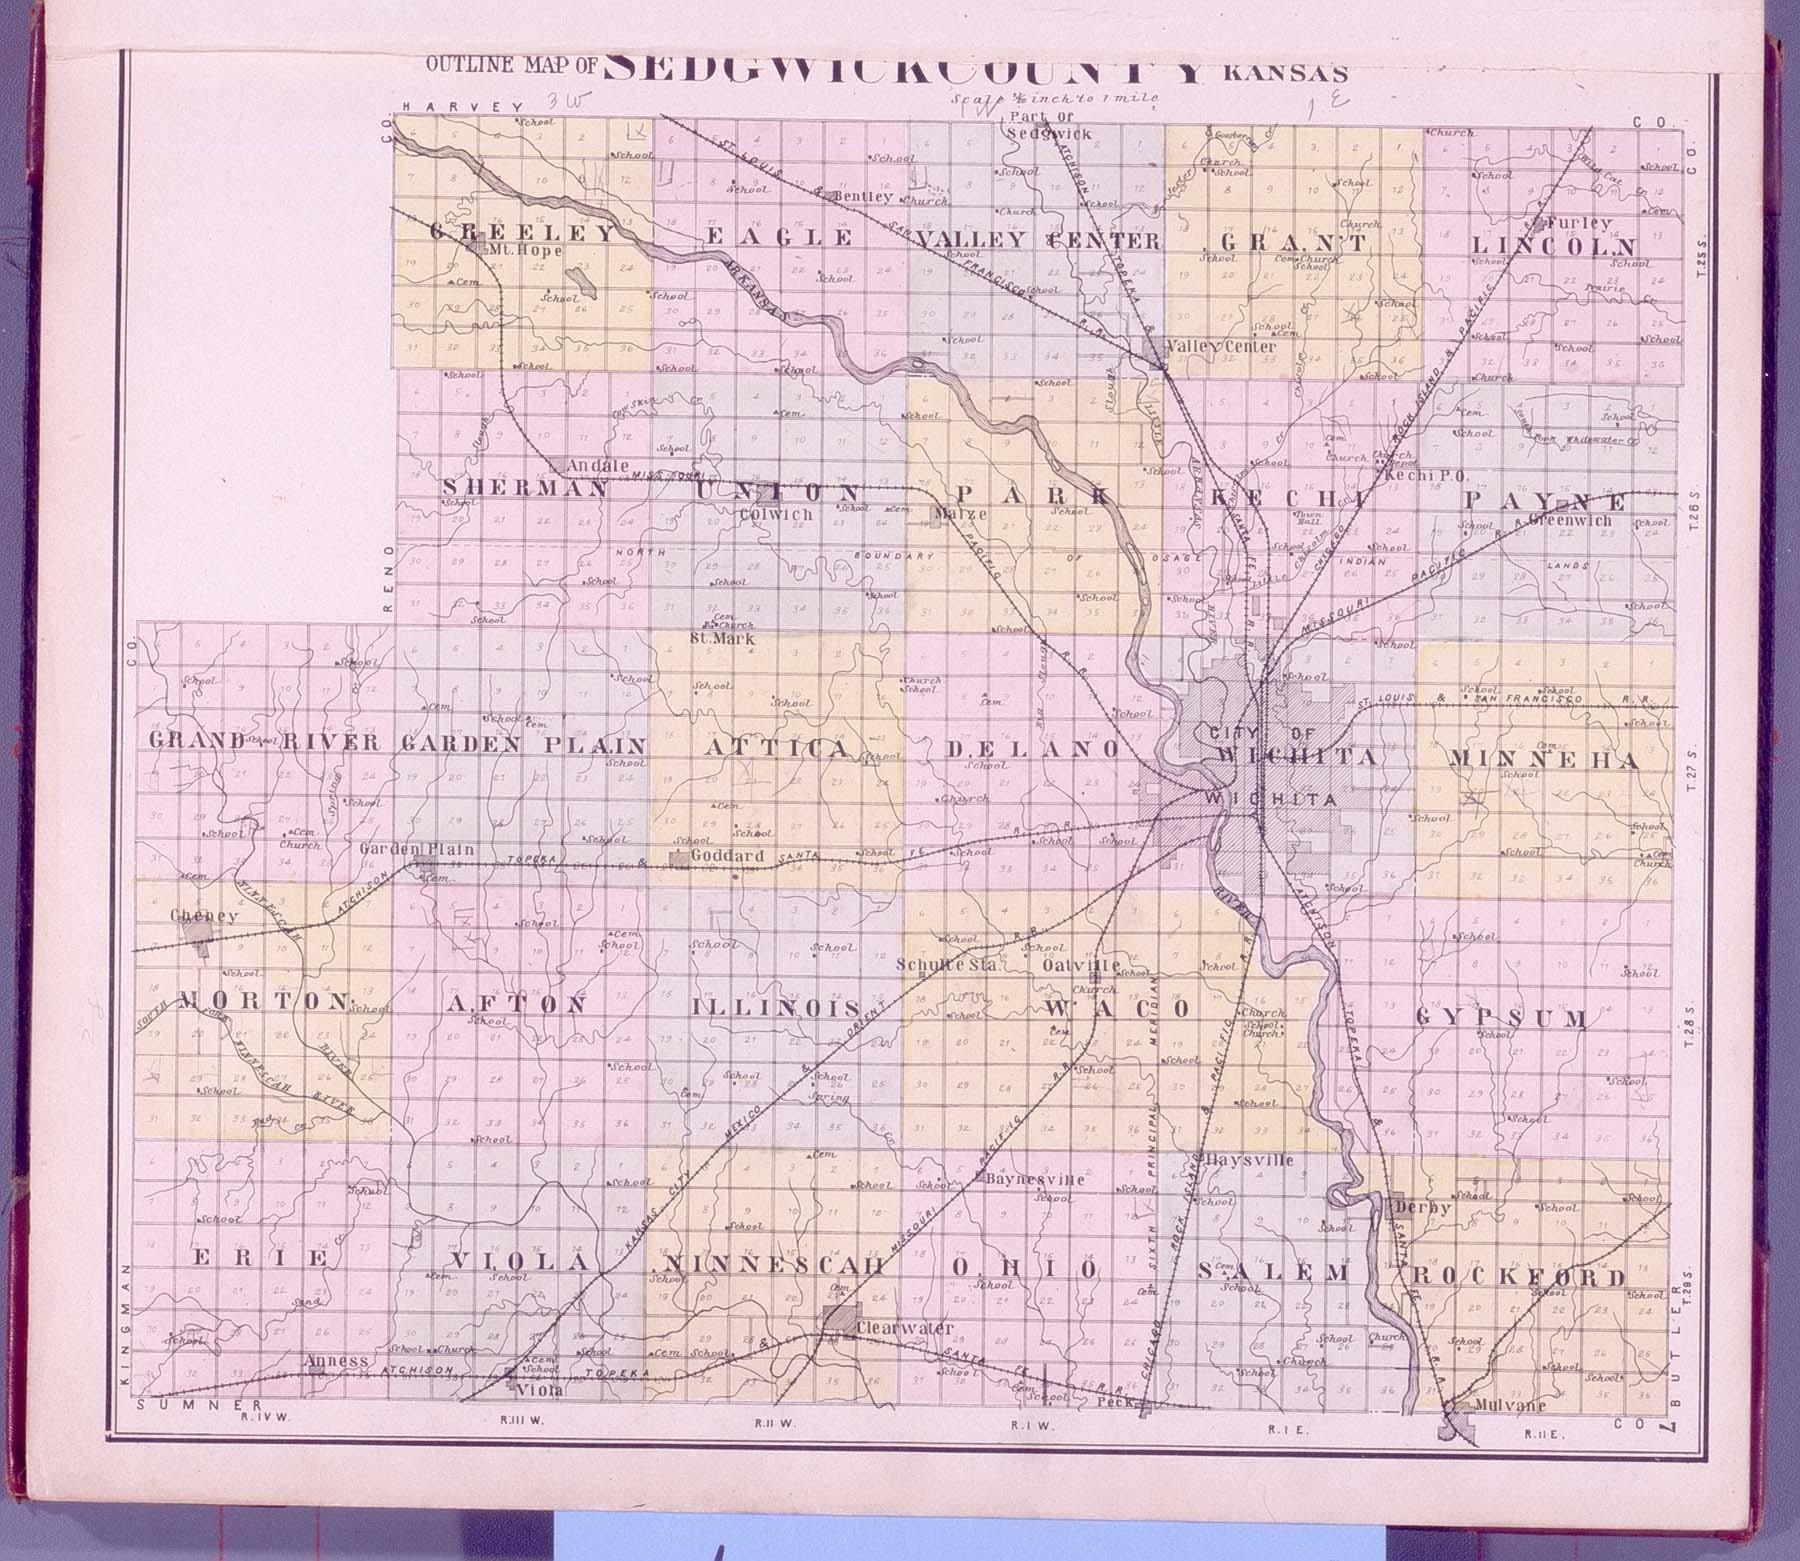 Standard atlas of Sedgwick County, Kansas - 7